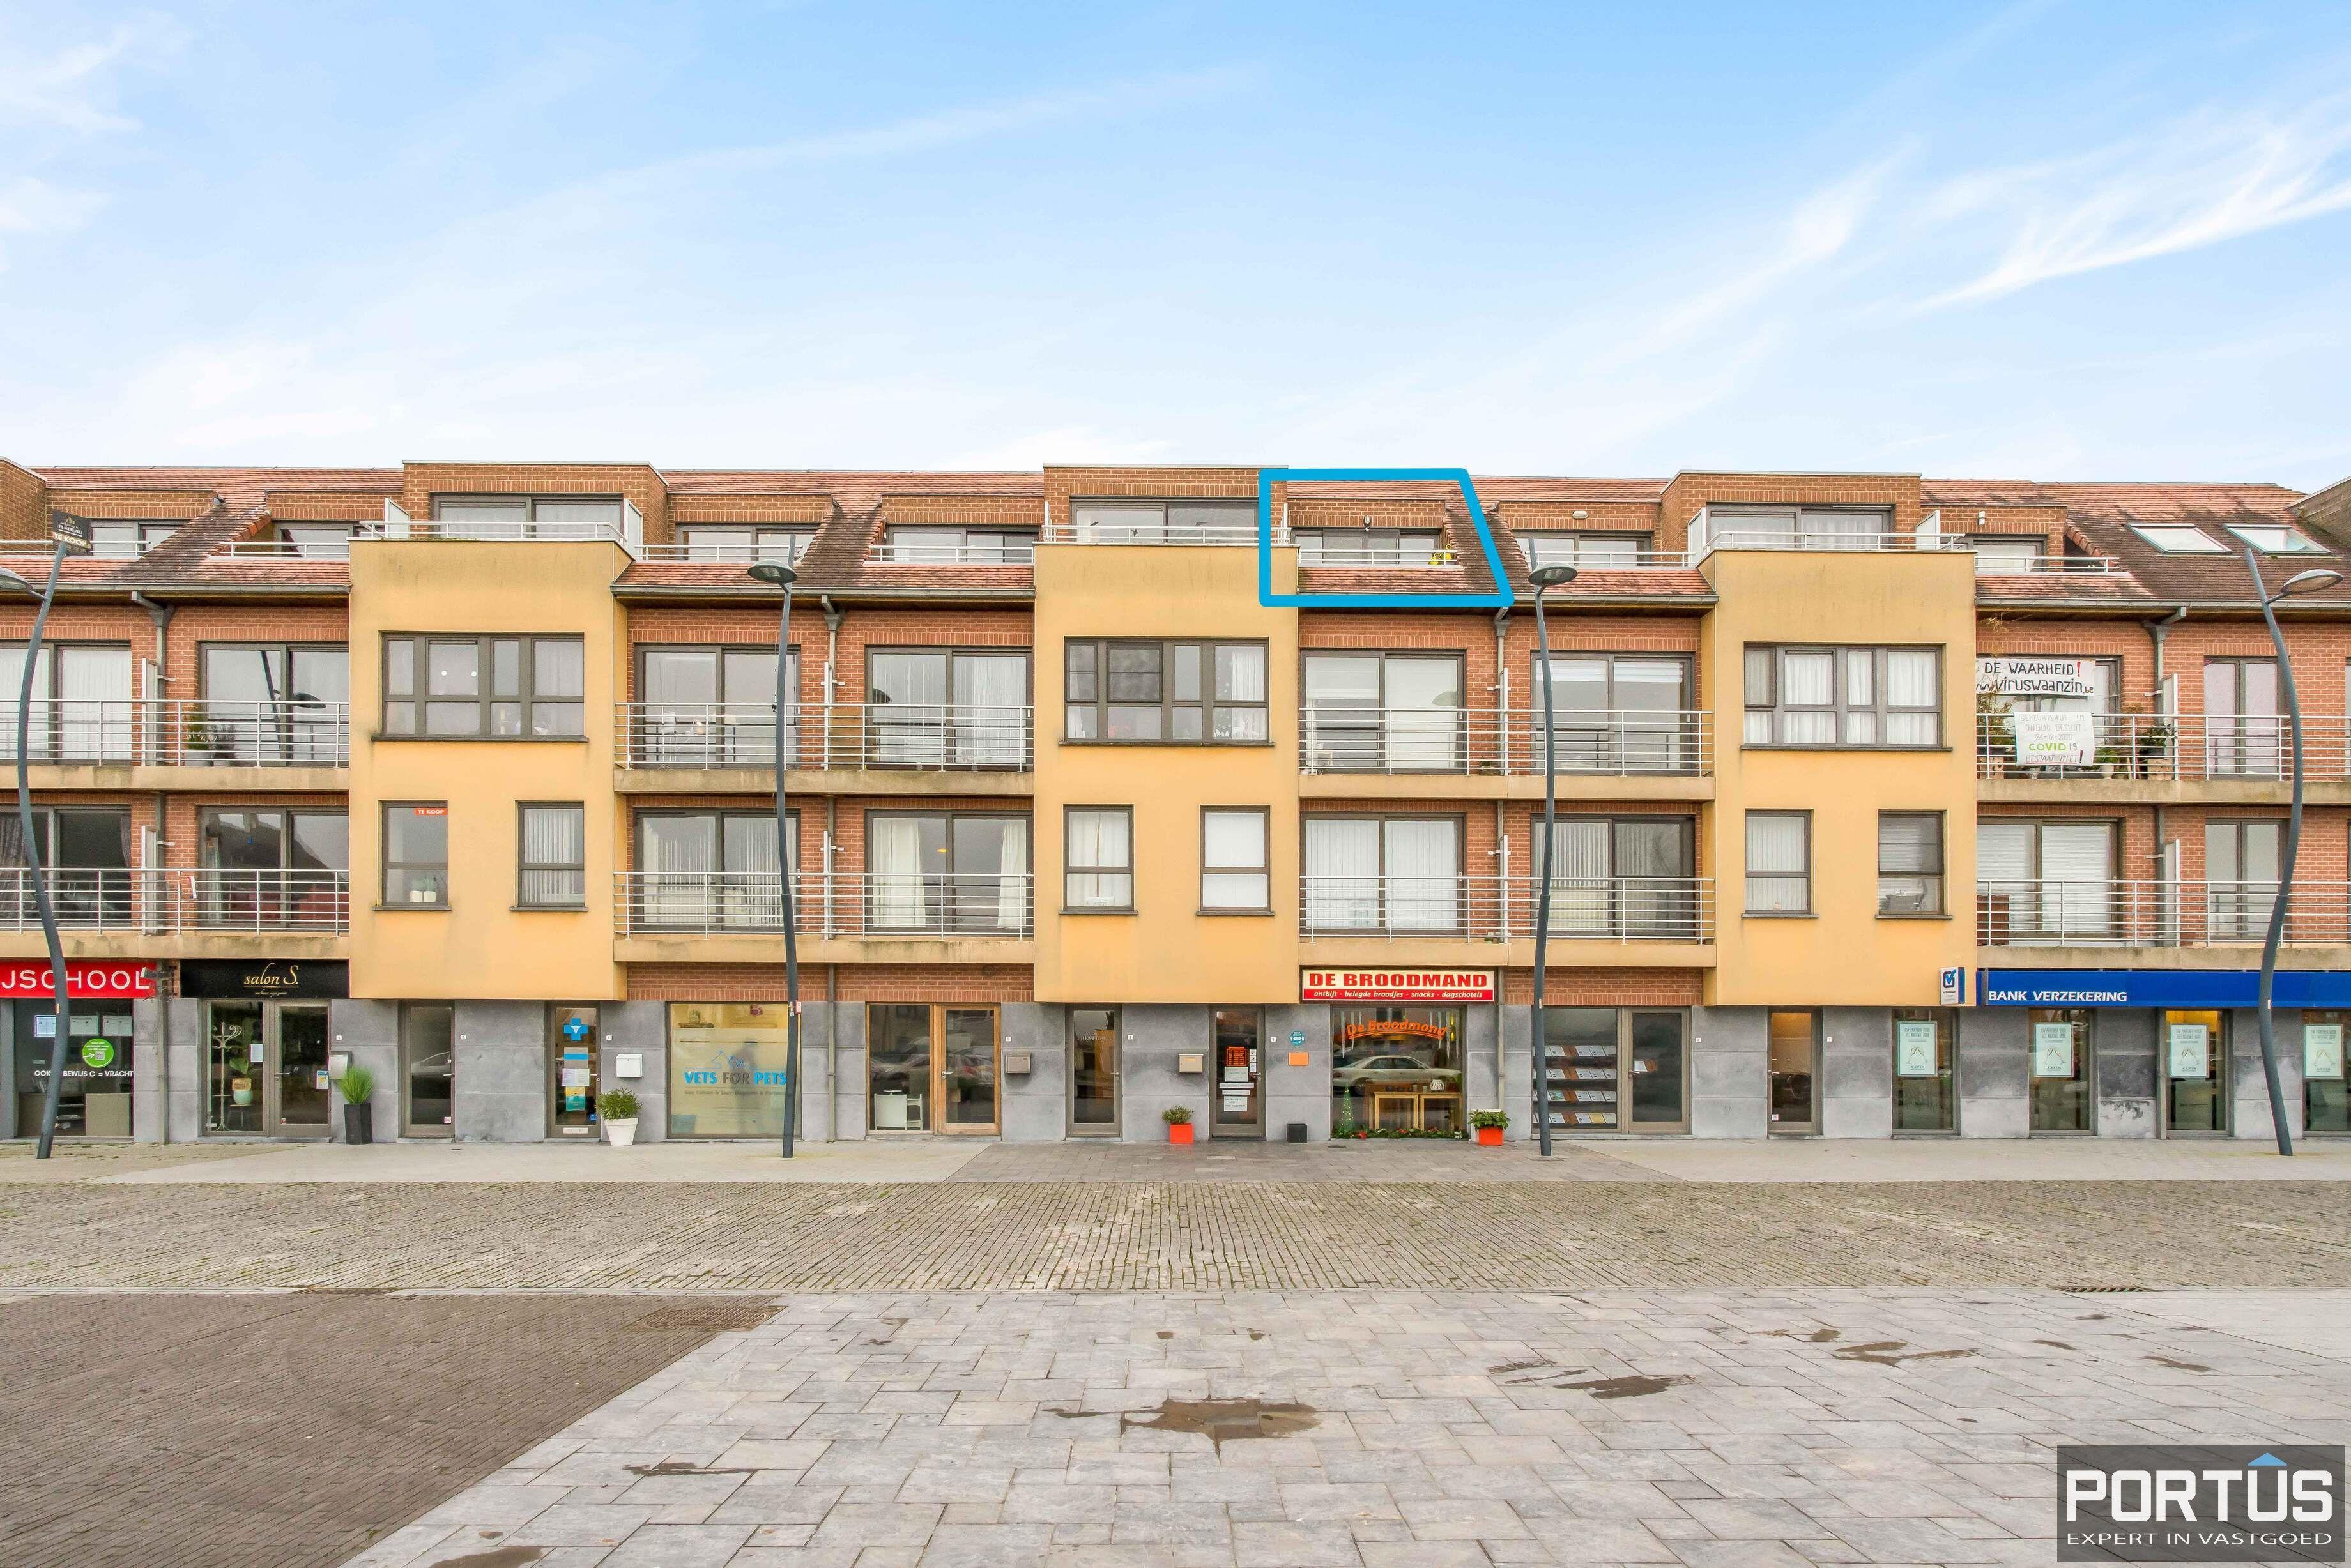 Instapklaar appartement met 1 slaapkamer te koop te Westende - 12052